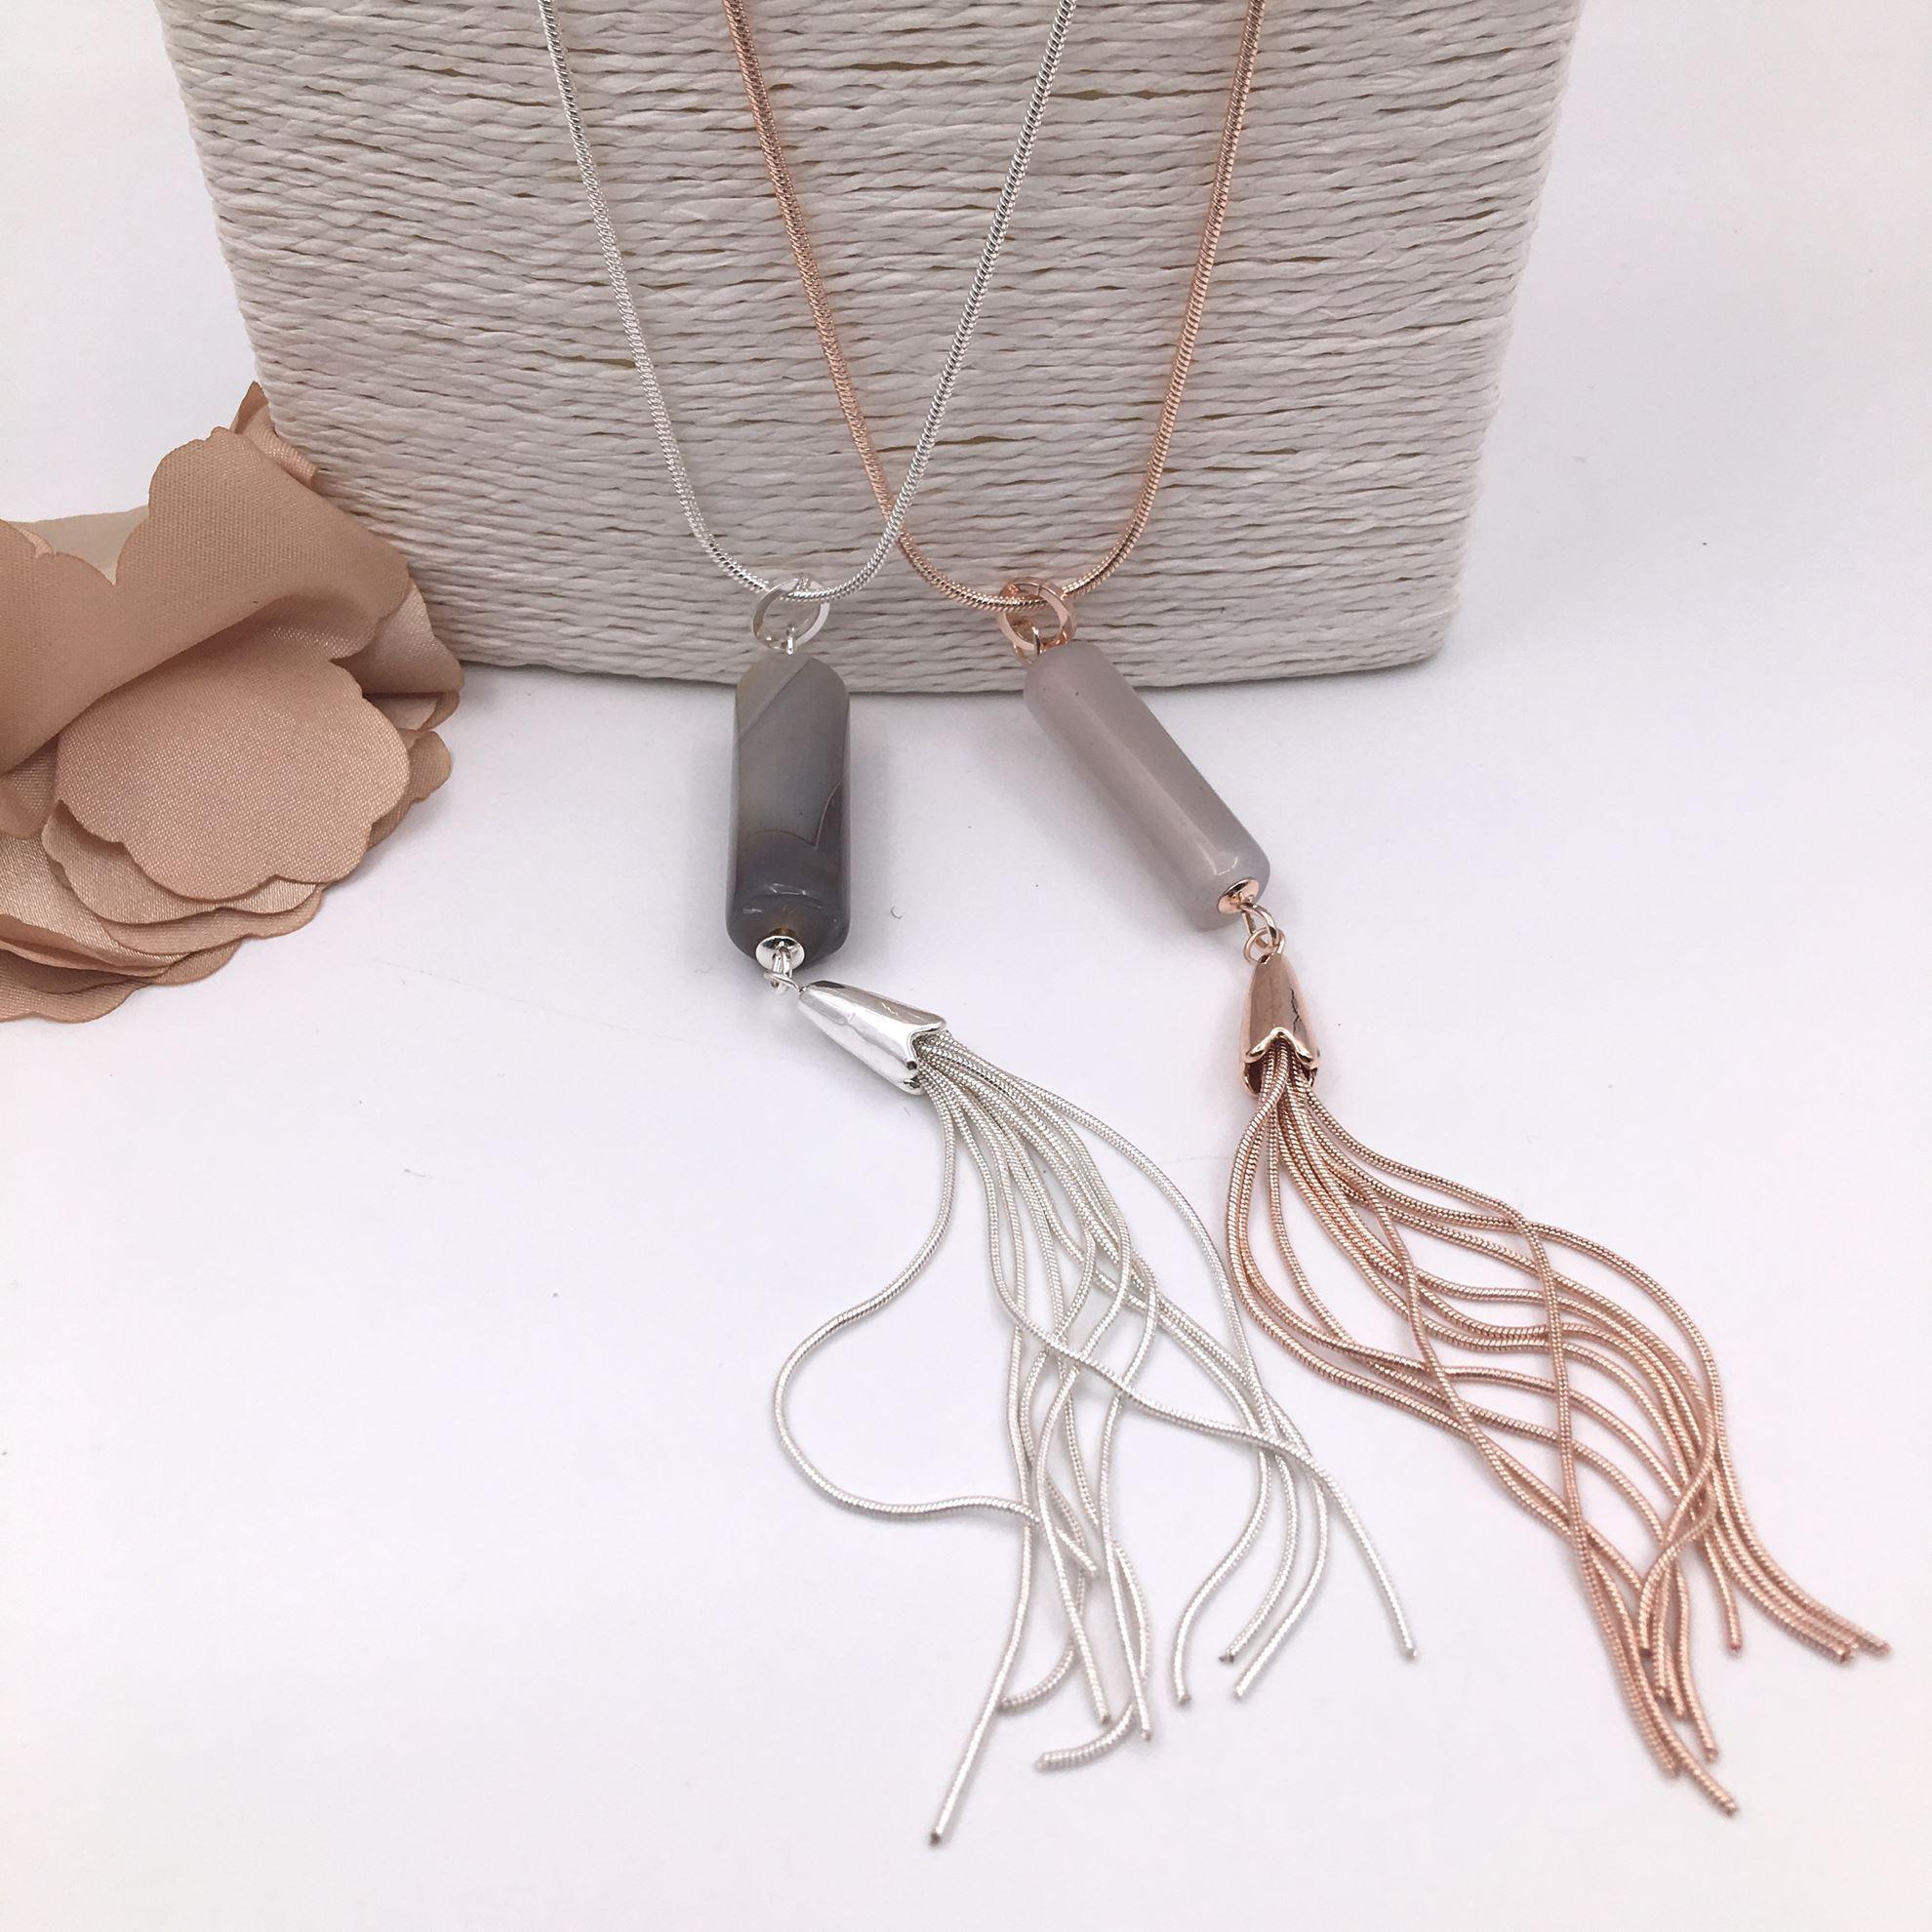 RE3003 Tubular & Tassle Necklace